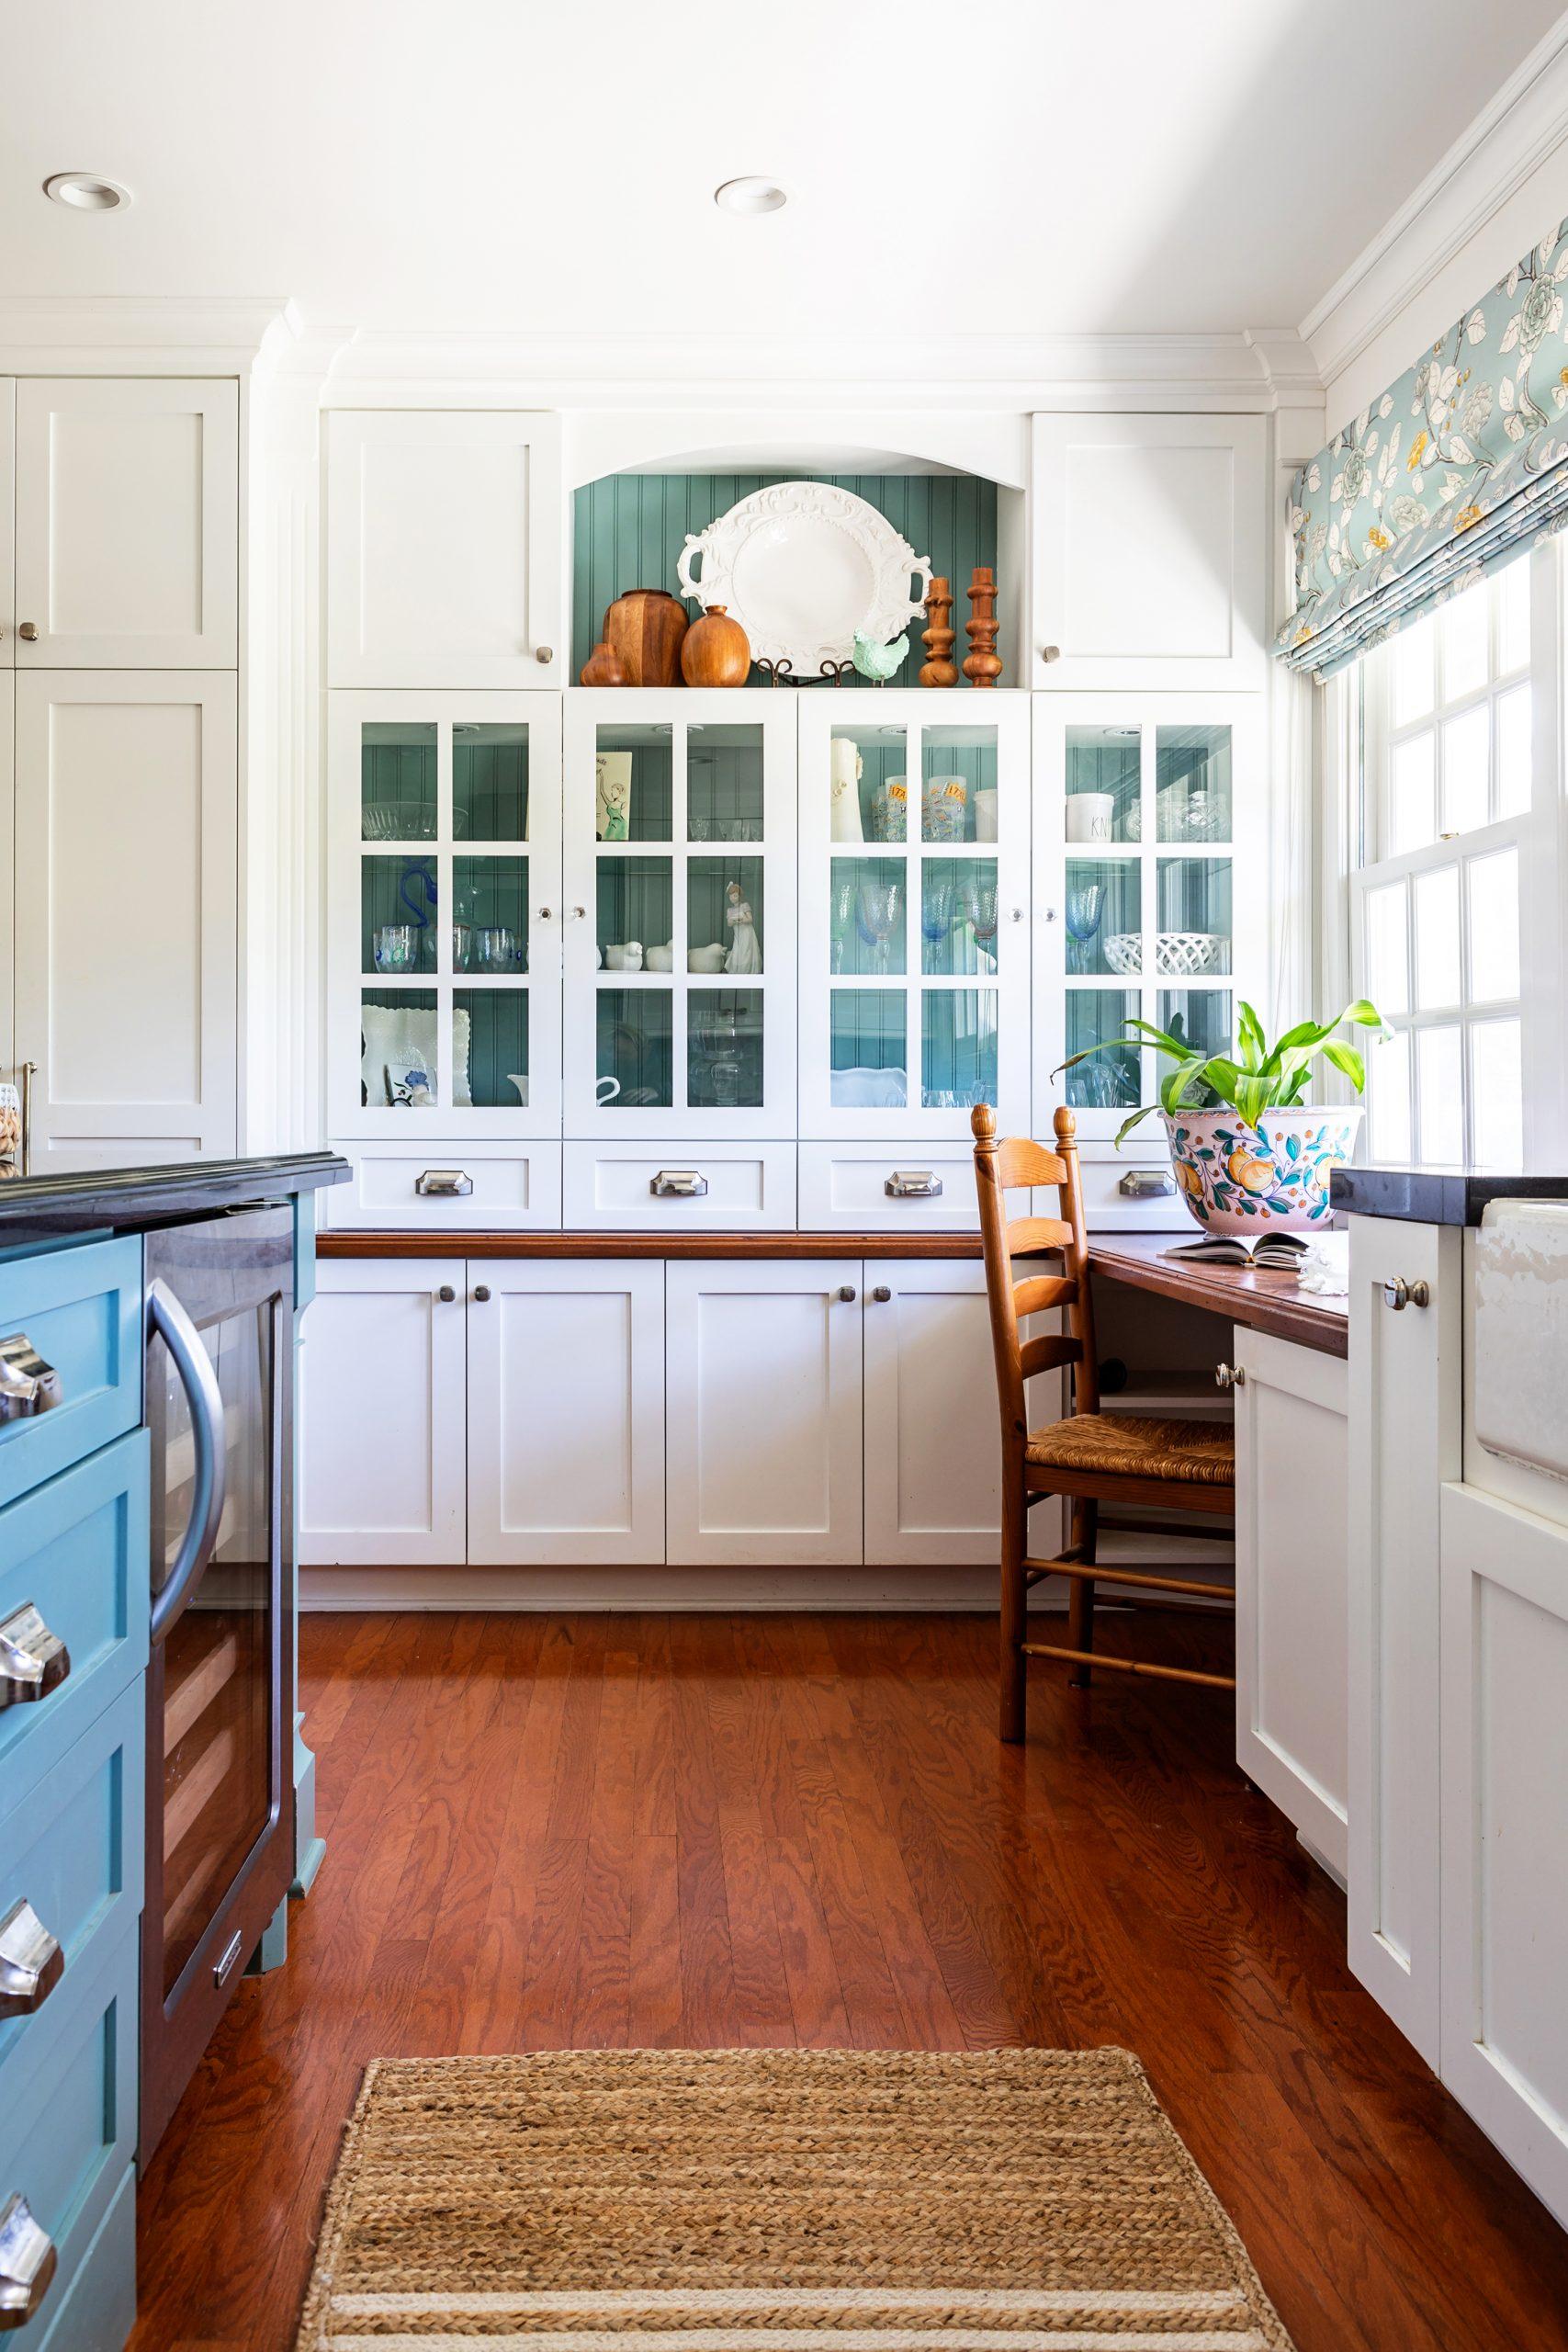 Kitchen Renovation in Hidden Hills, CA - JLK interiors - bright, family-friendly kitchen - kitchen desk